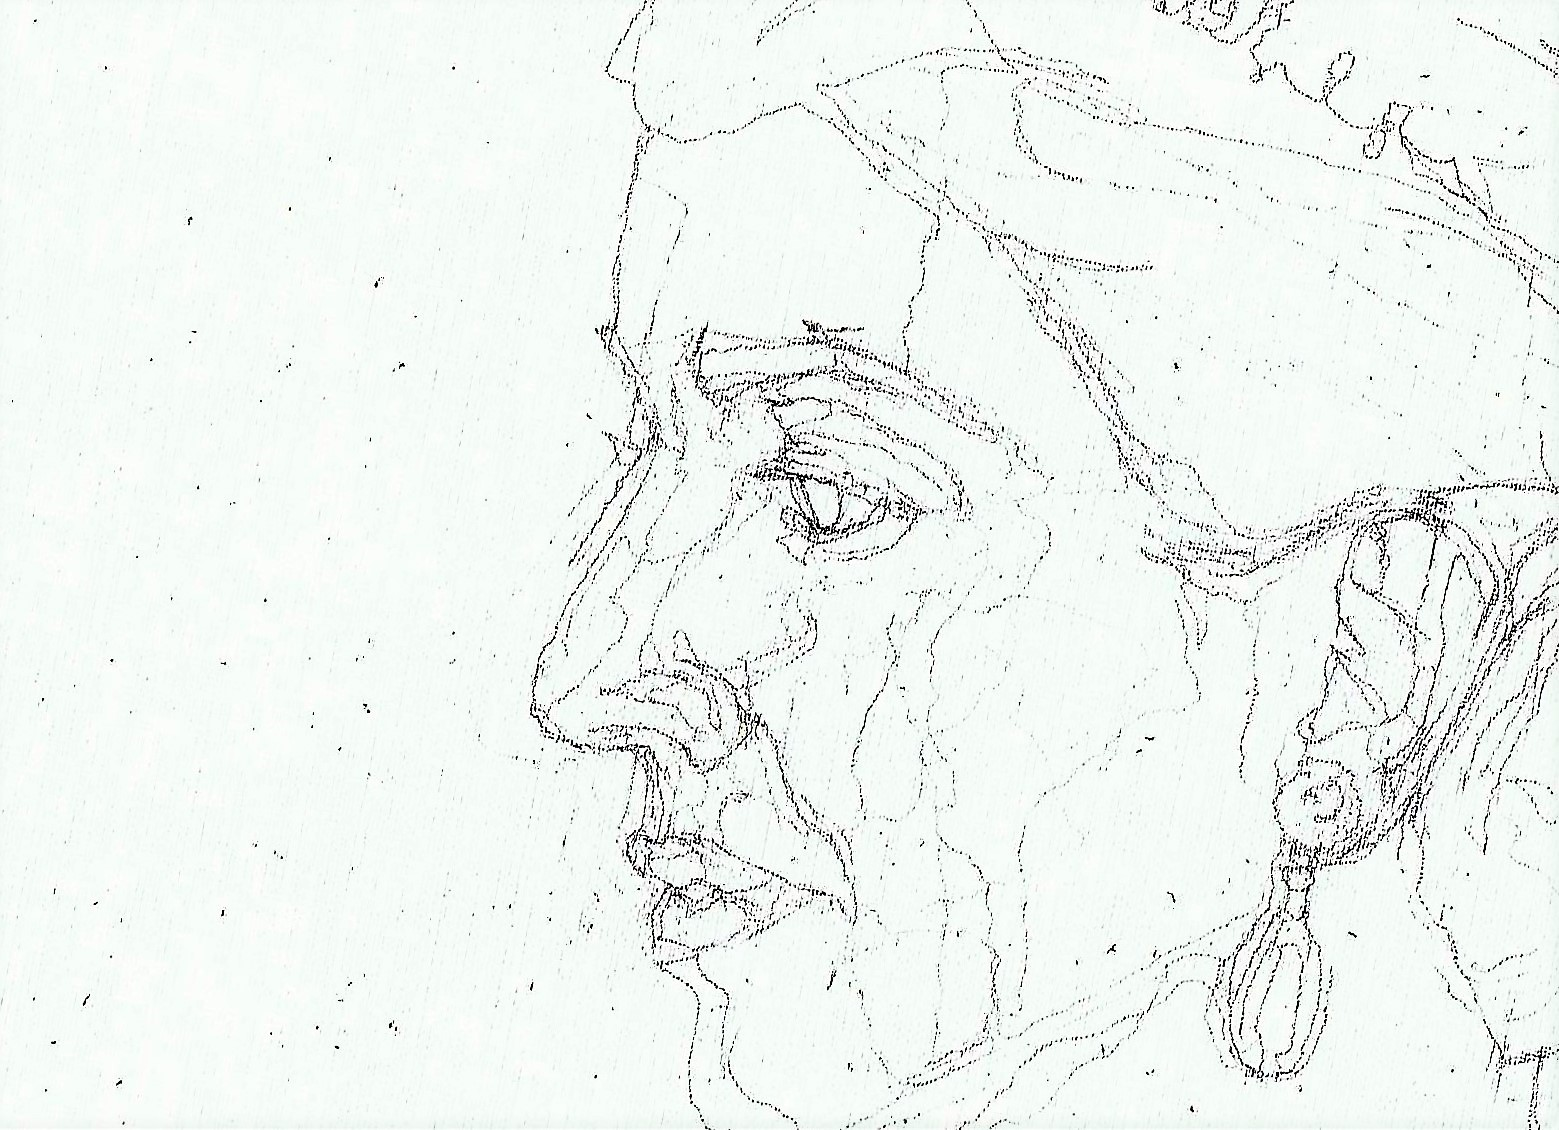 365 dagen een portret 65 Maxima, koningin Potlood 19c25